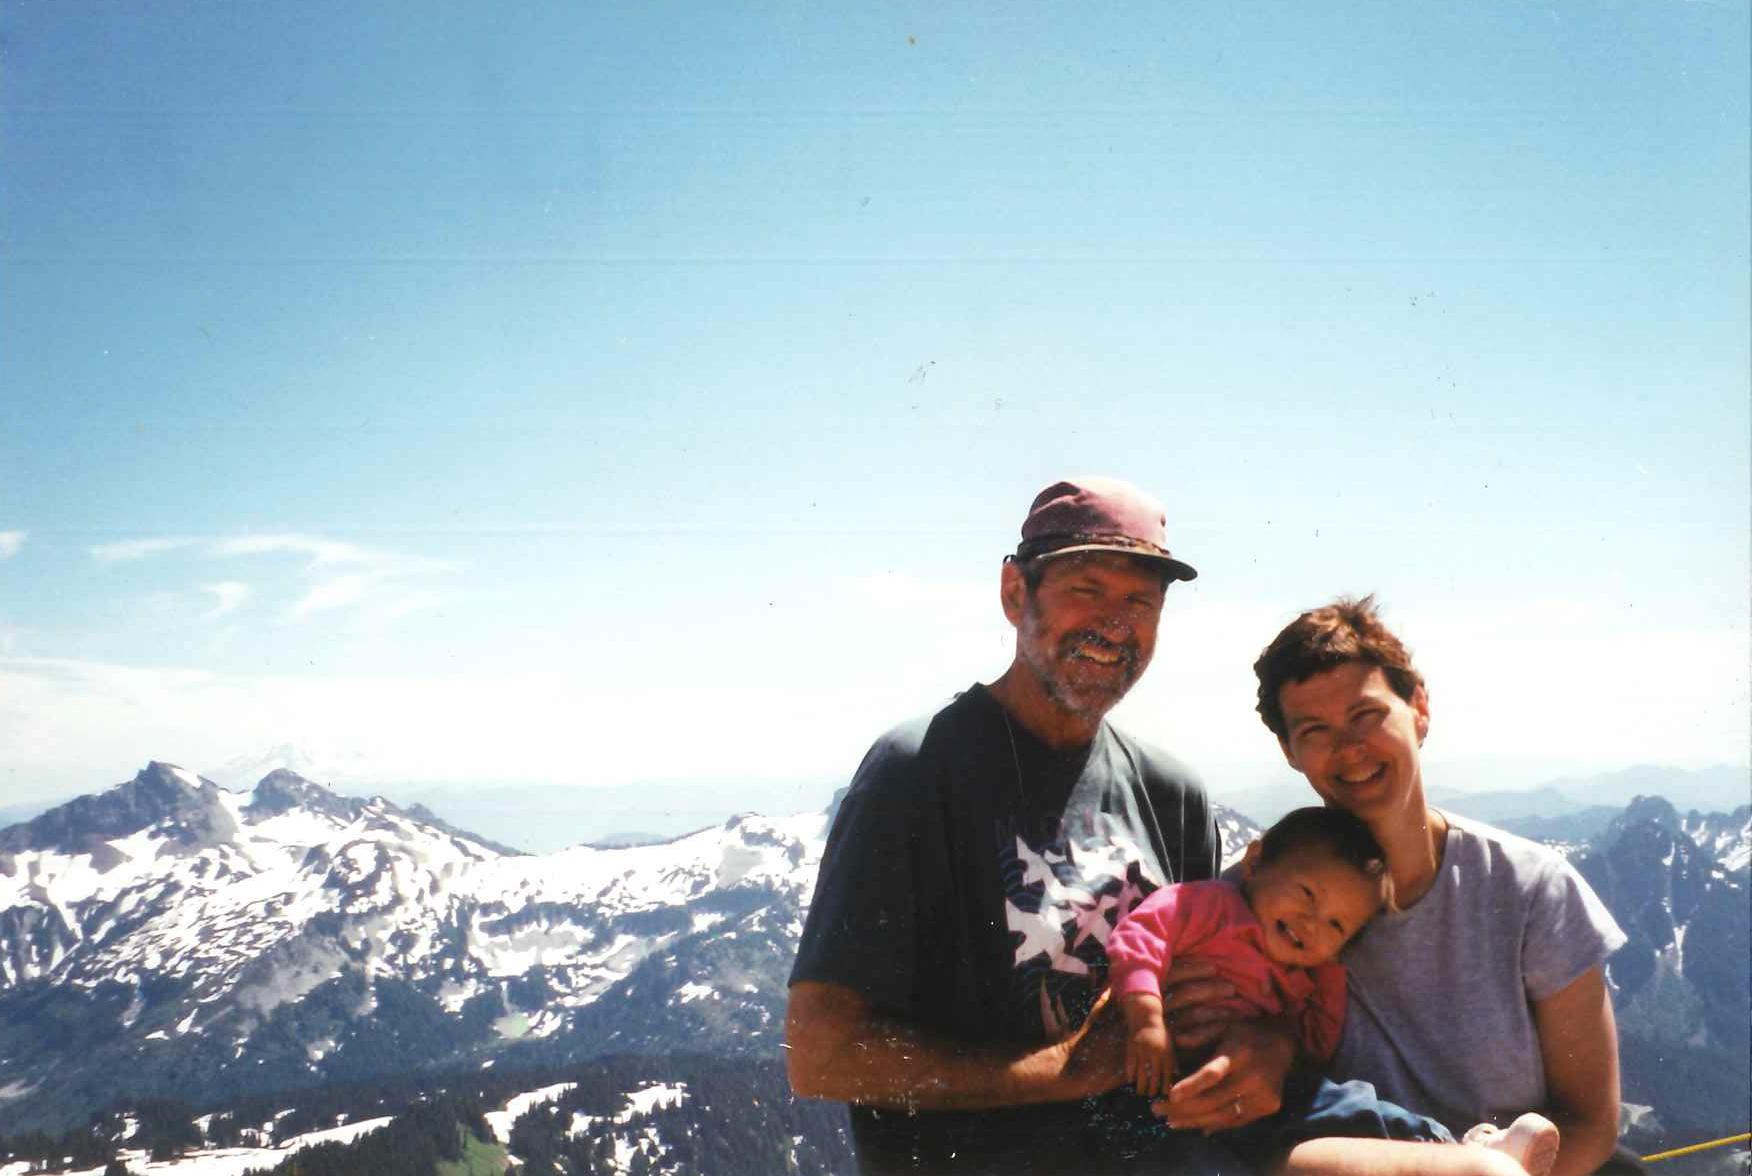 Caption: Maya and her parents., Credit: Courtesy of Maya Konz